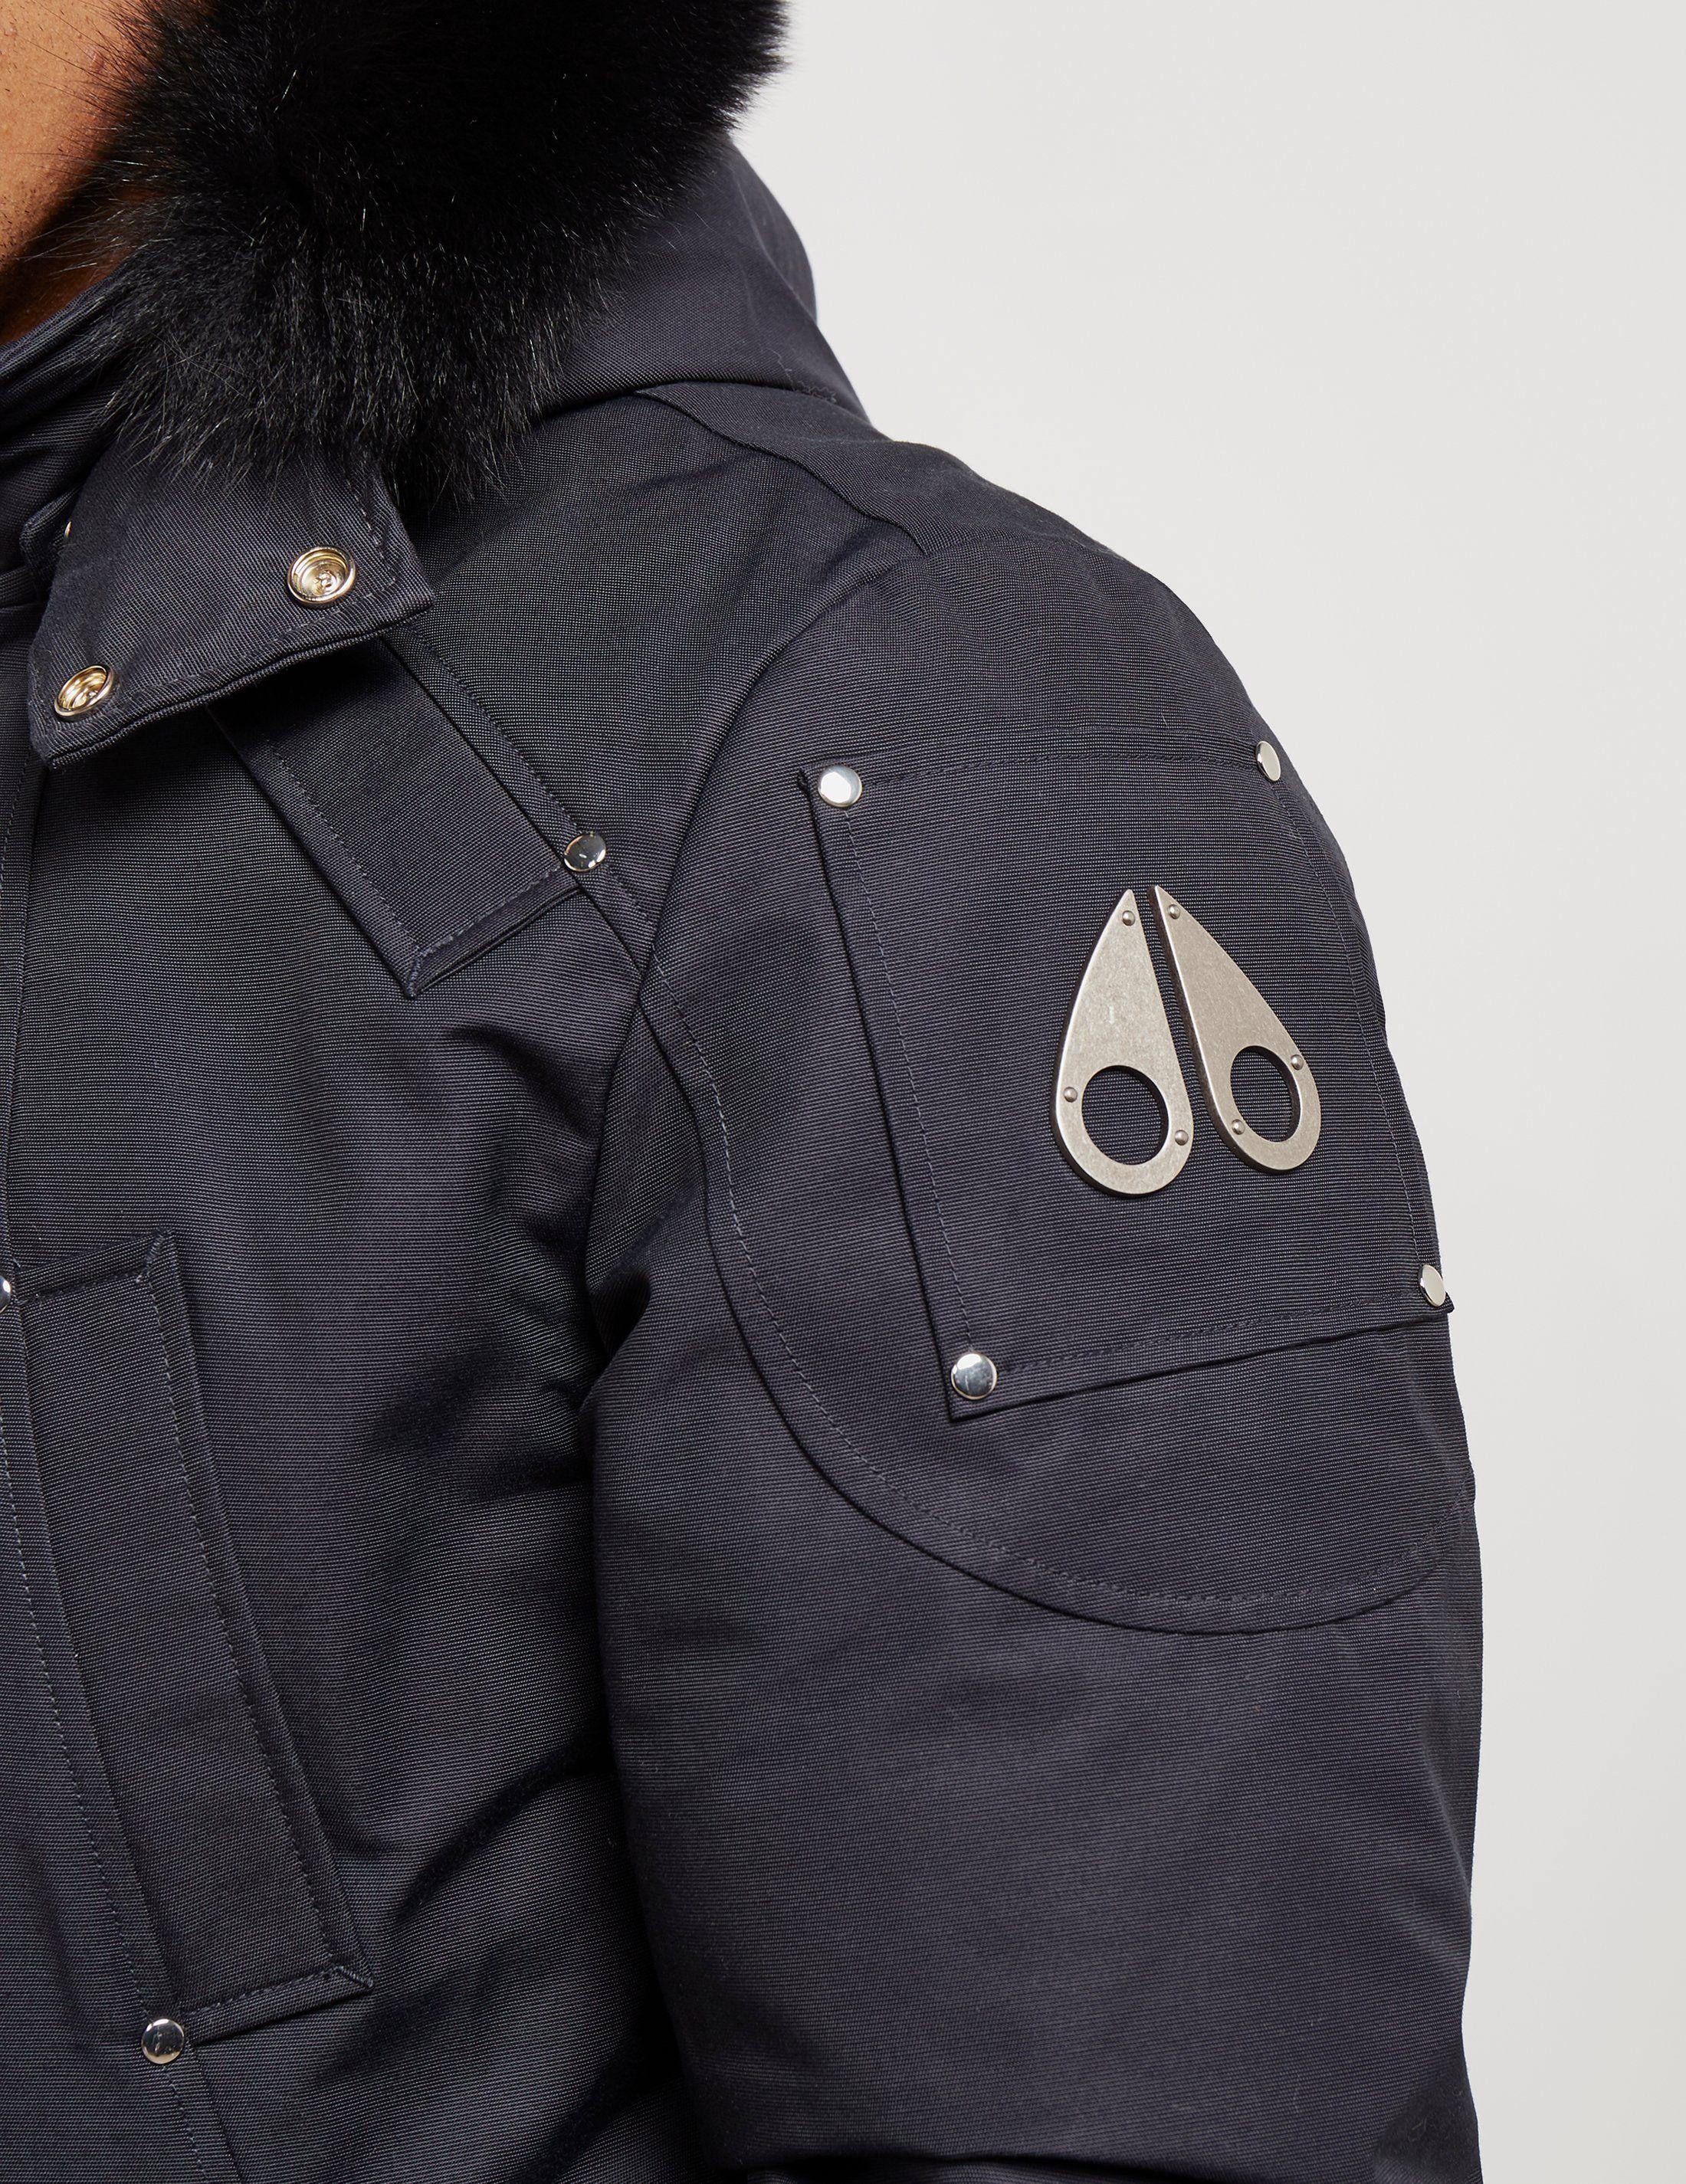 Moose Knuckles Ballistic Bomber Jacket